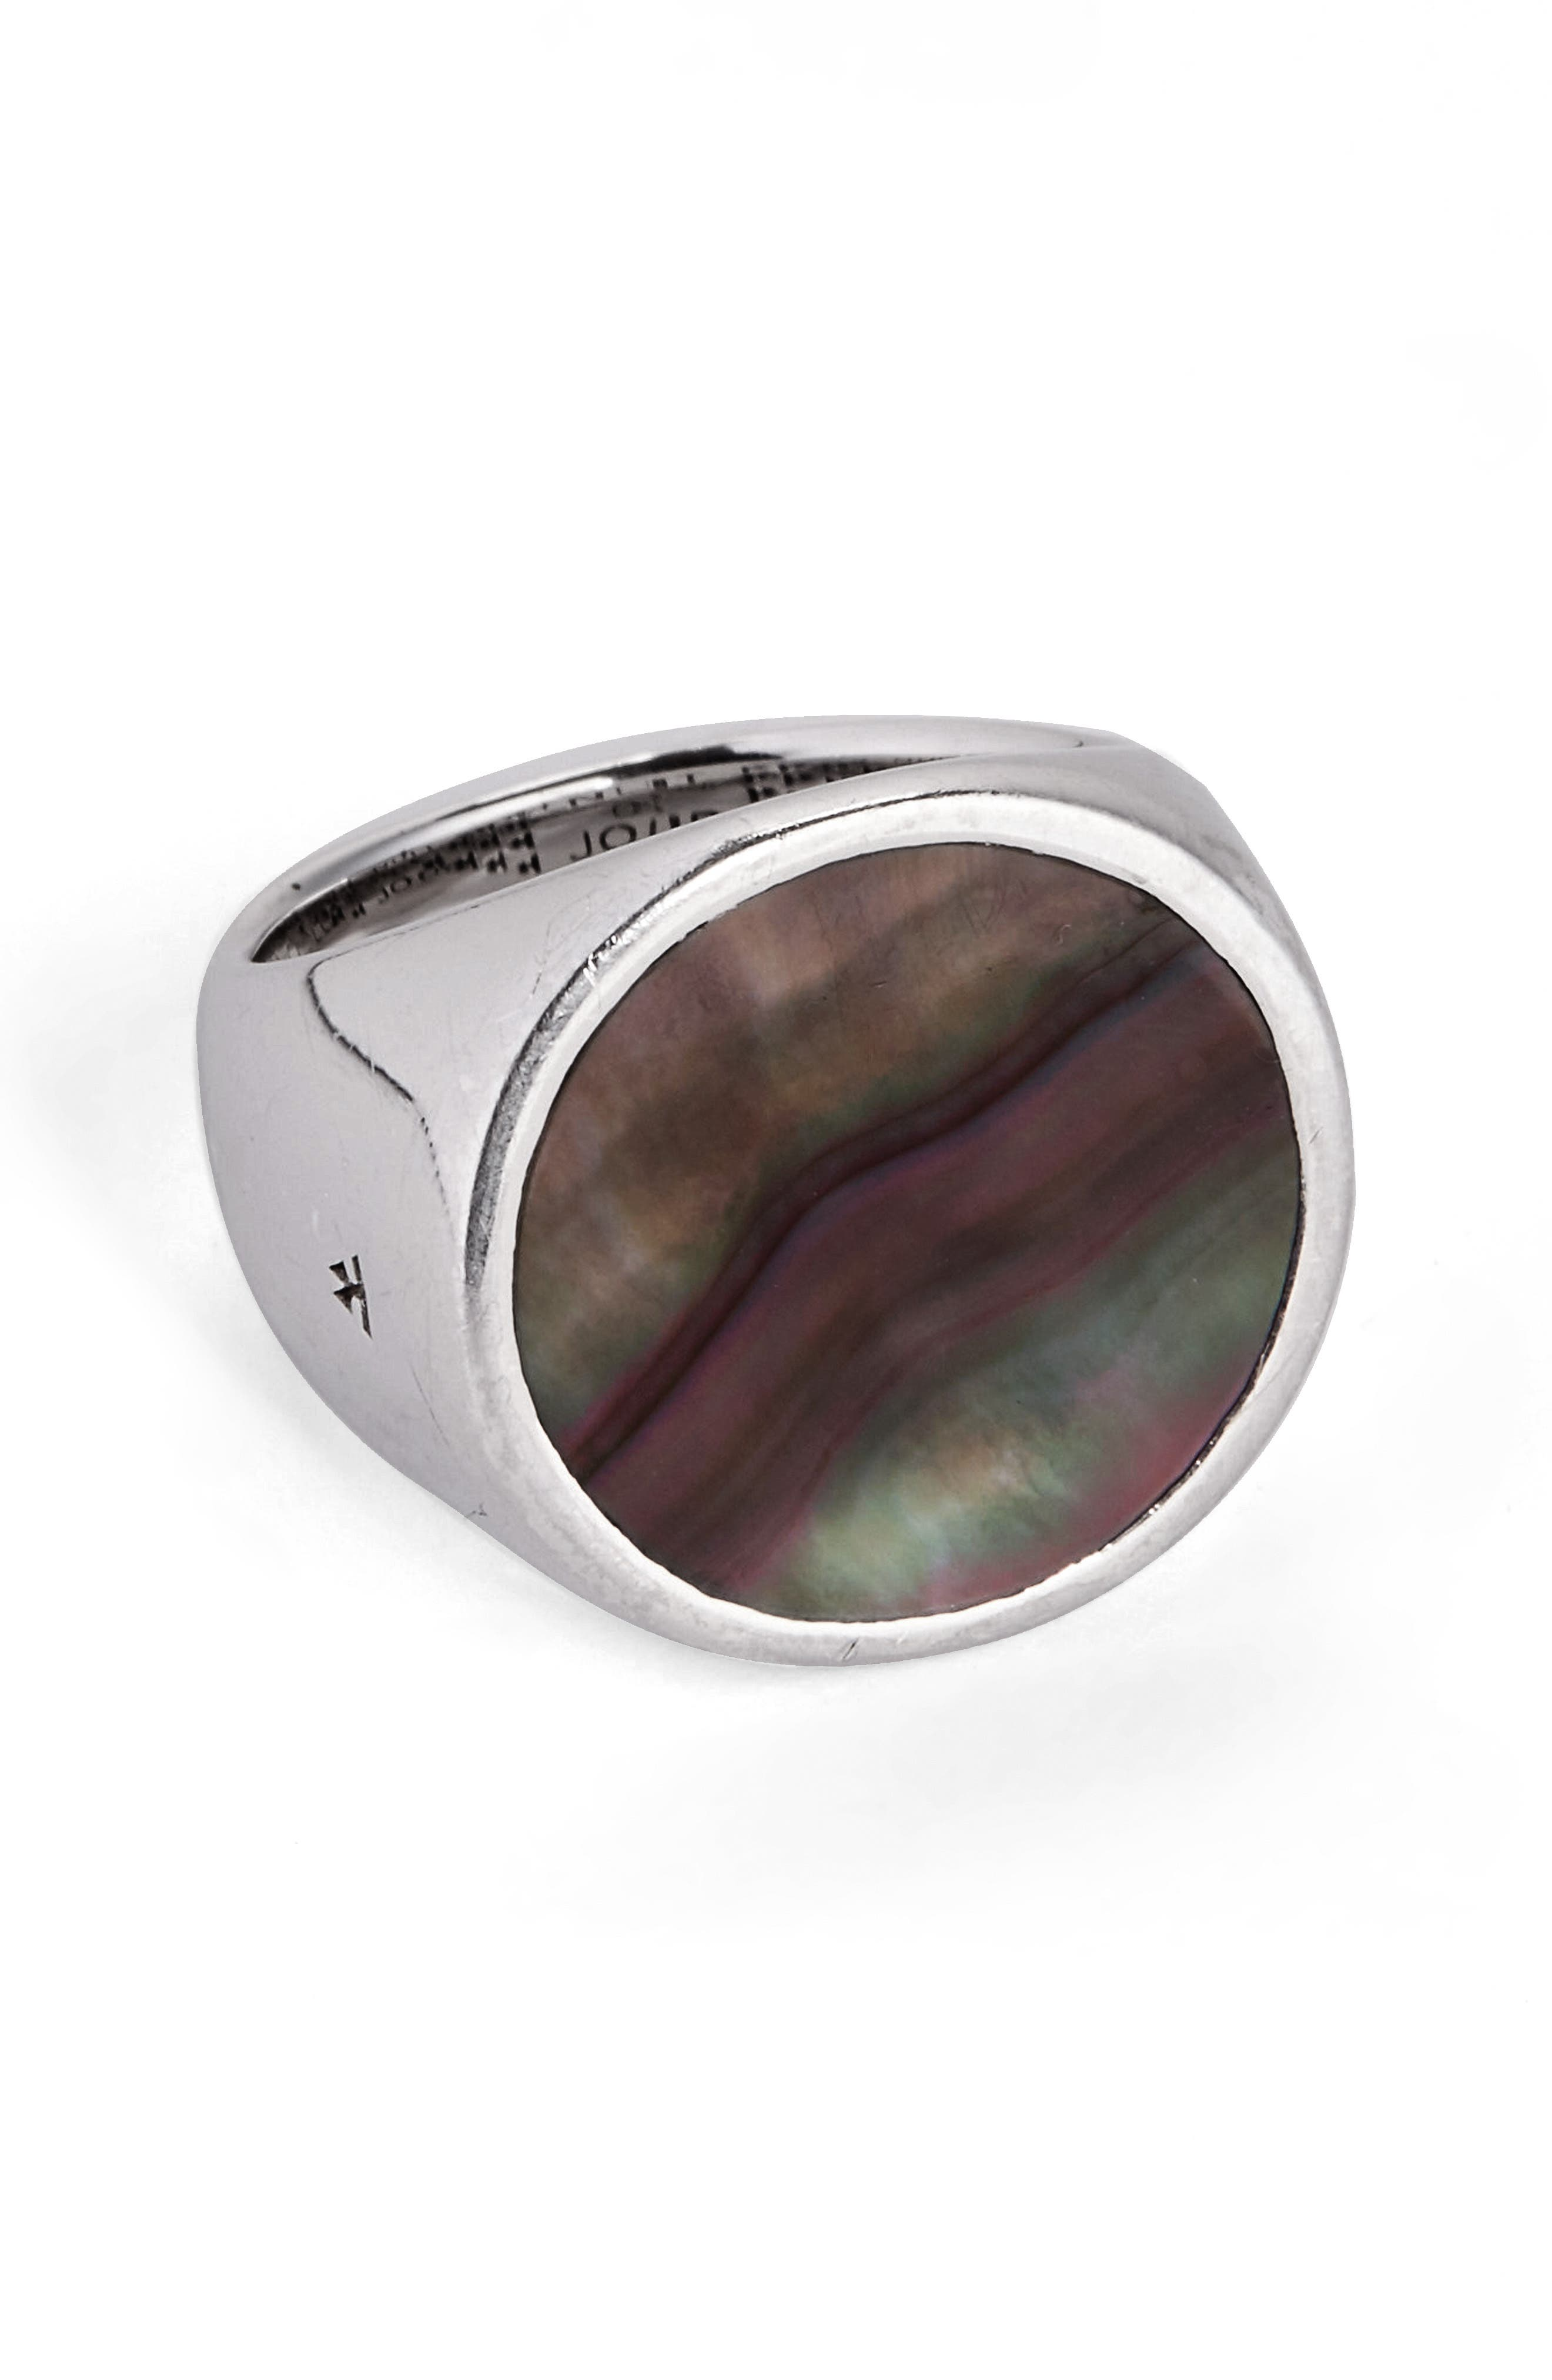 Alternate Image 1 Selected - Tom Wood Flush Black Mother of Pearl Signet Ring (Nordstrom Exclusive)